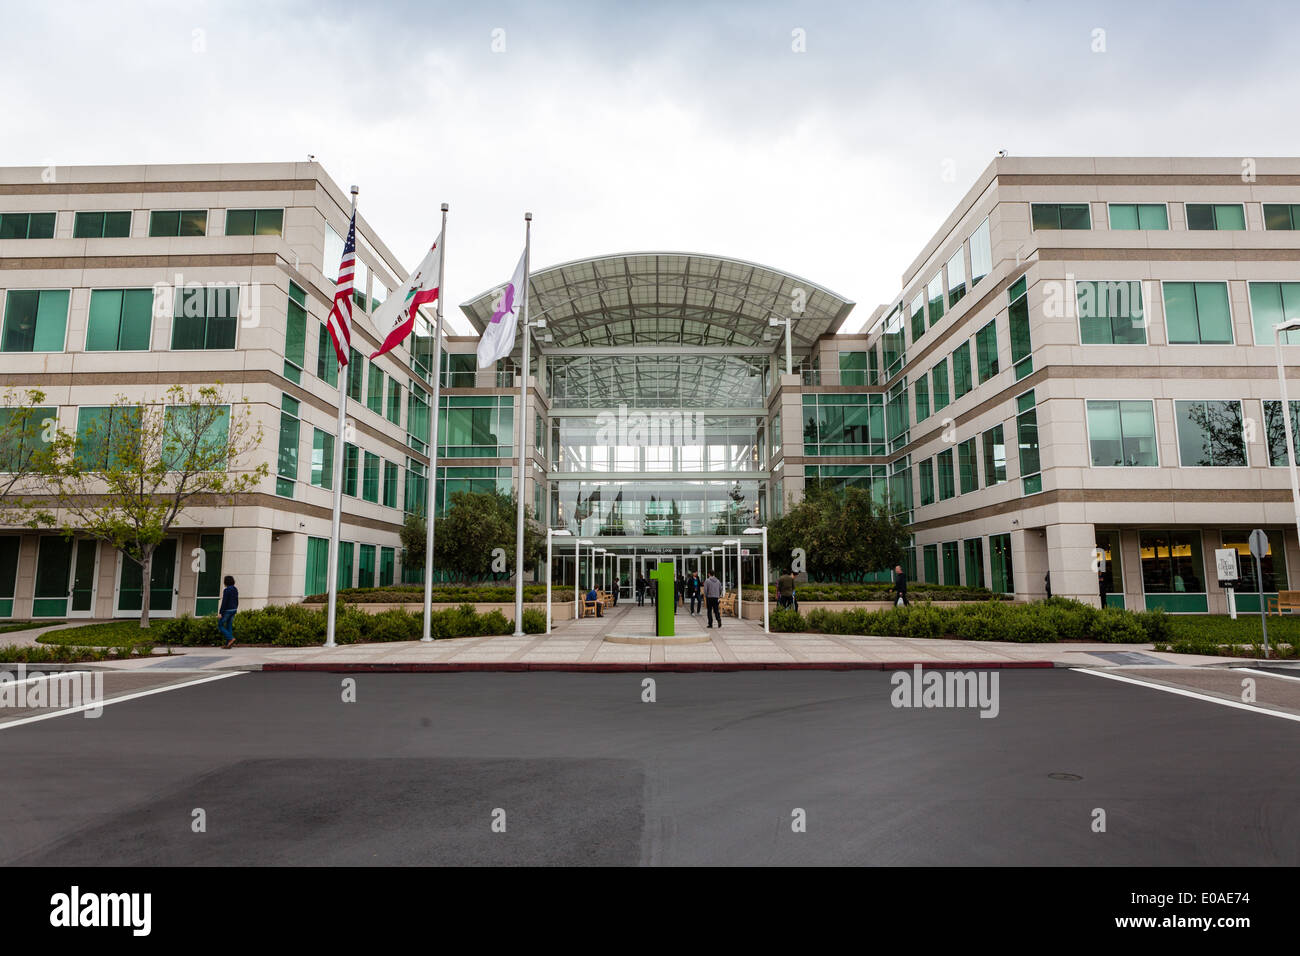 apple cupertino office. Cupertino Apple Office. Headquarters, Cupertino, California - Stock Image Office E